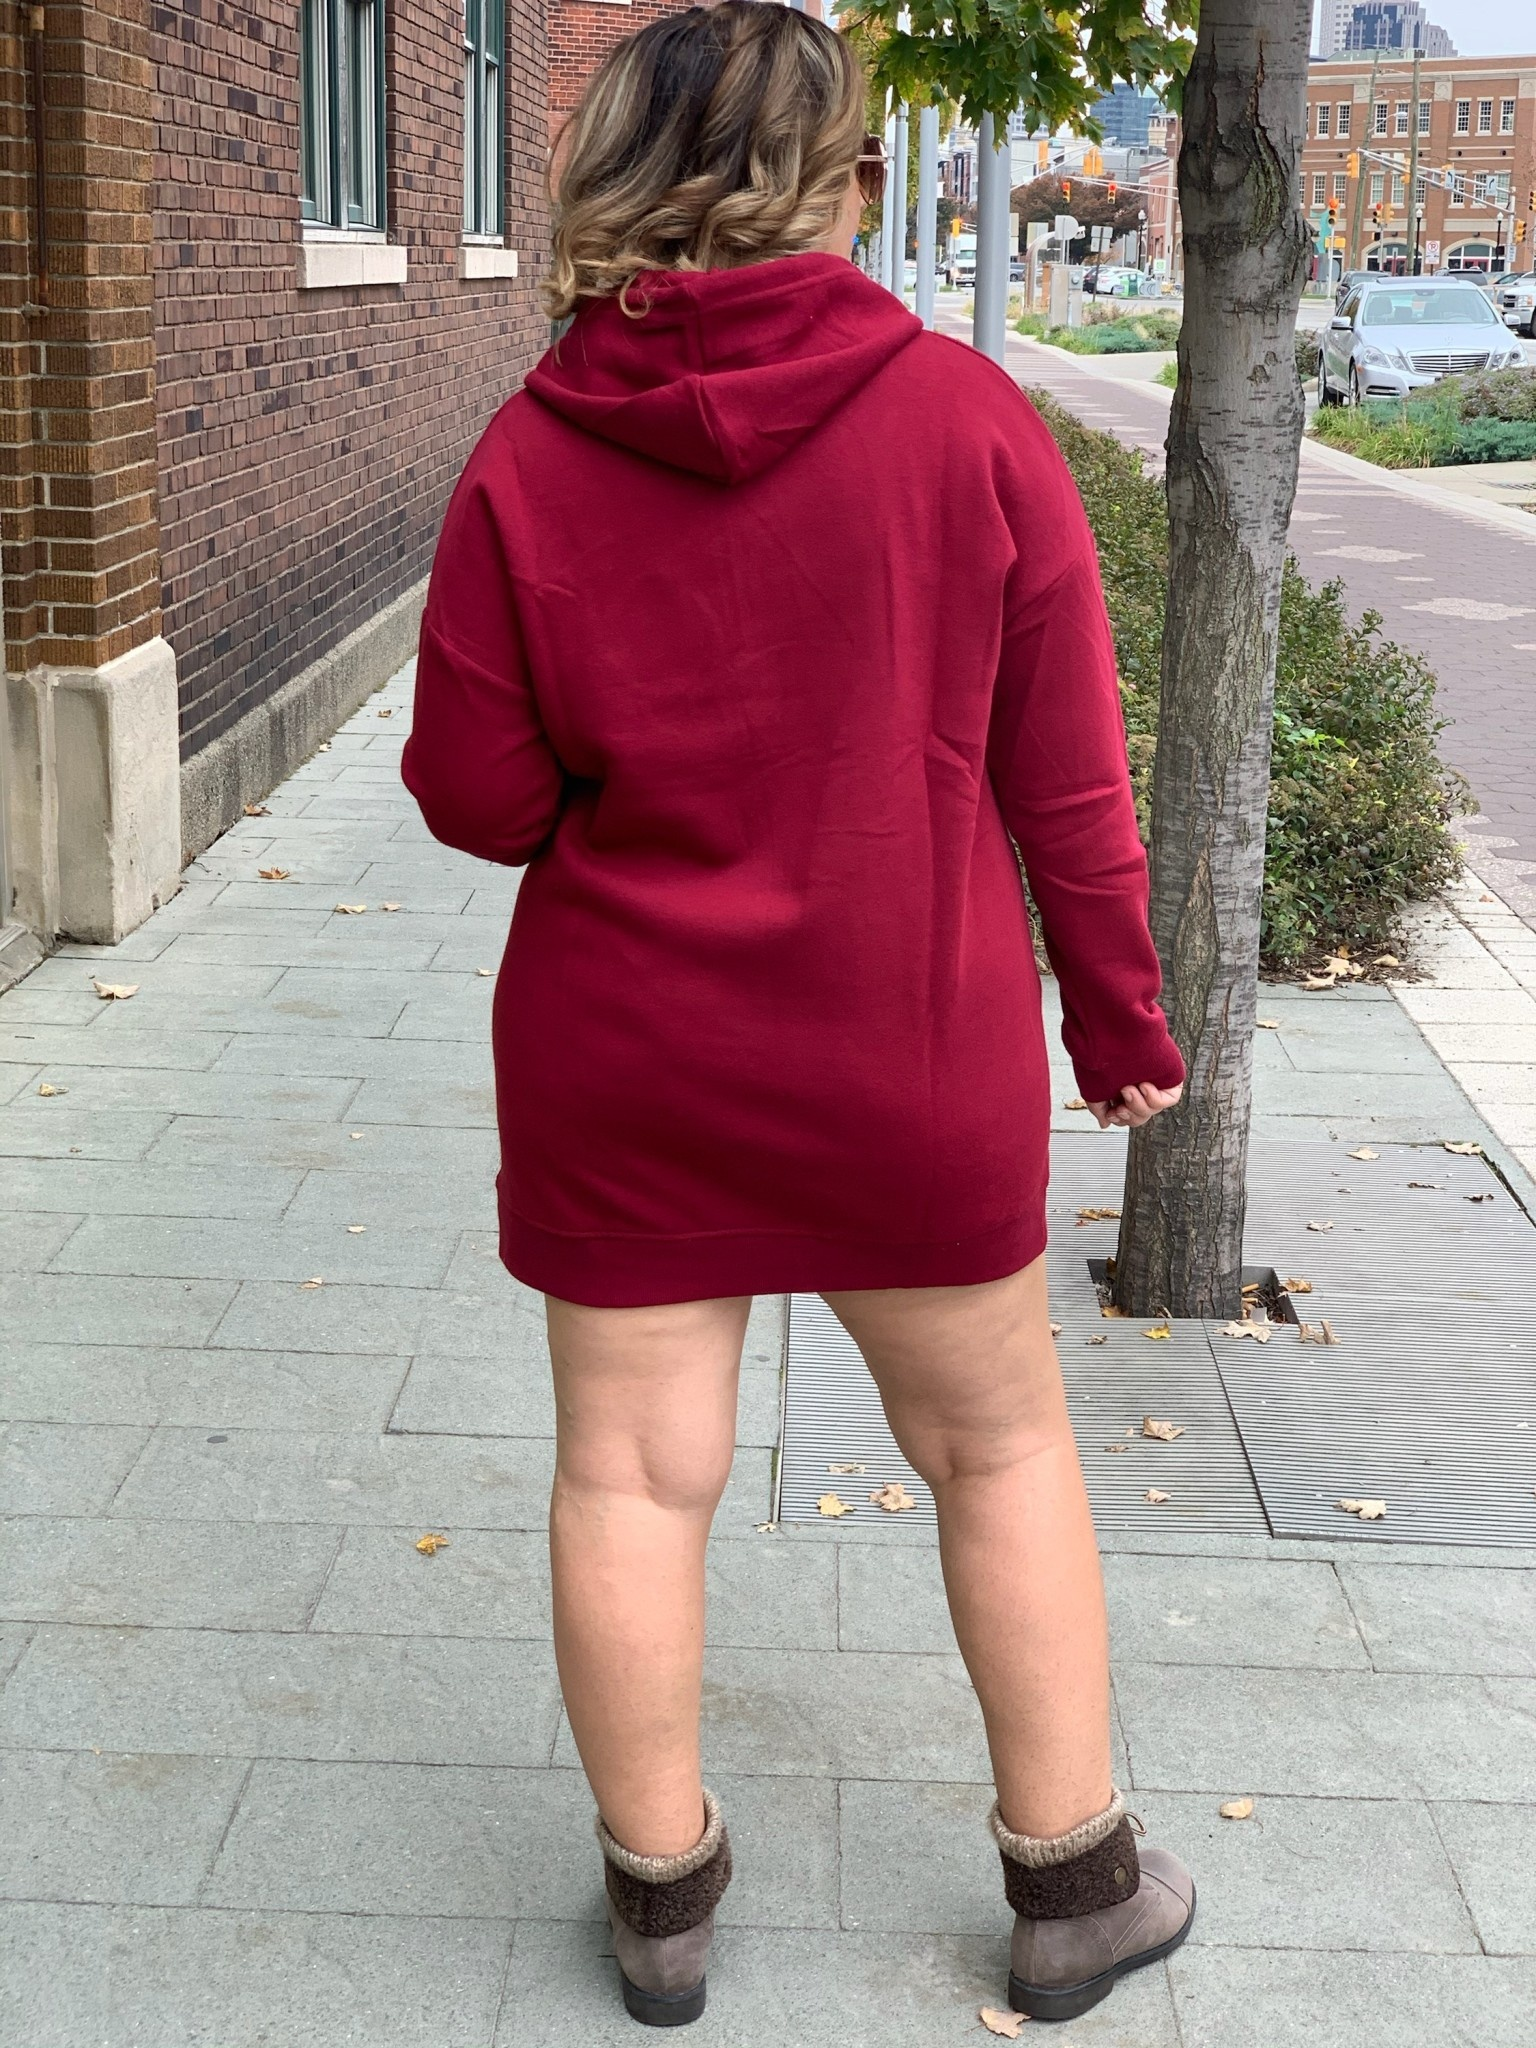 Cabernet Tunic Hooded Sweatshirt